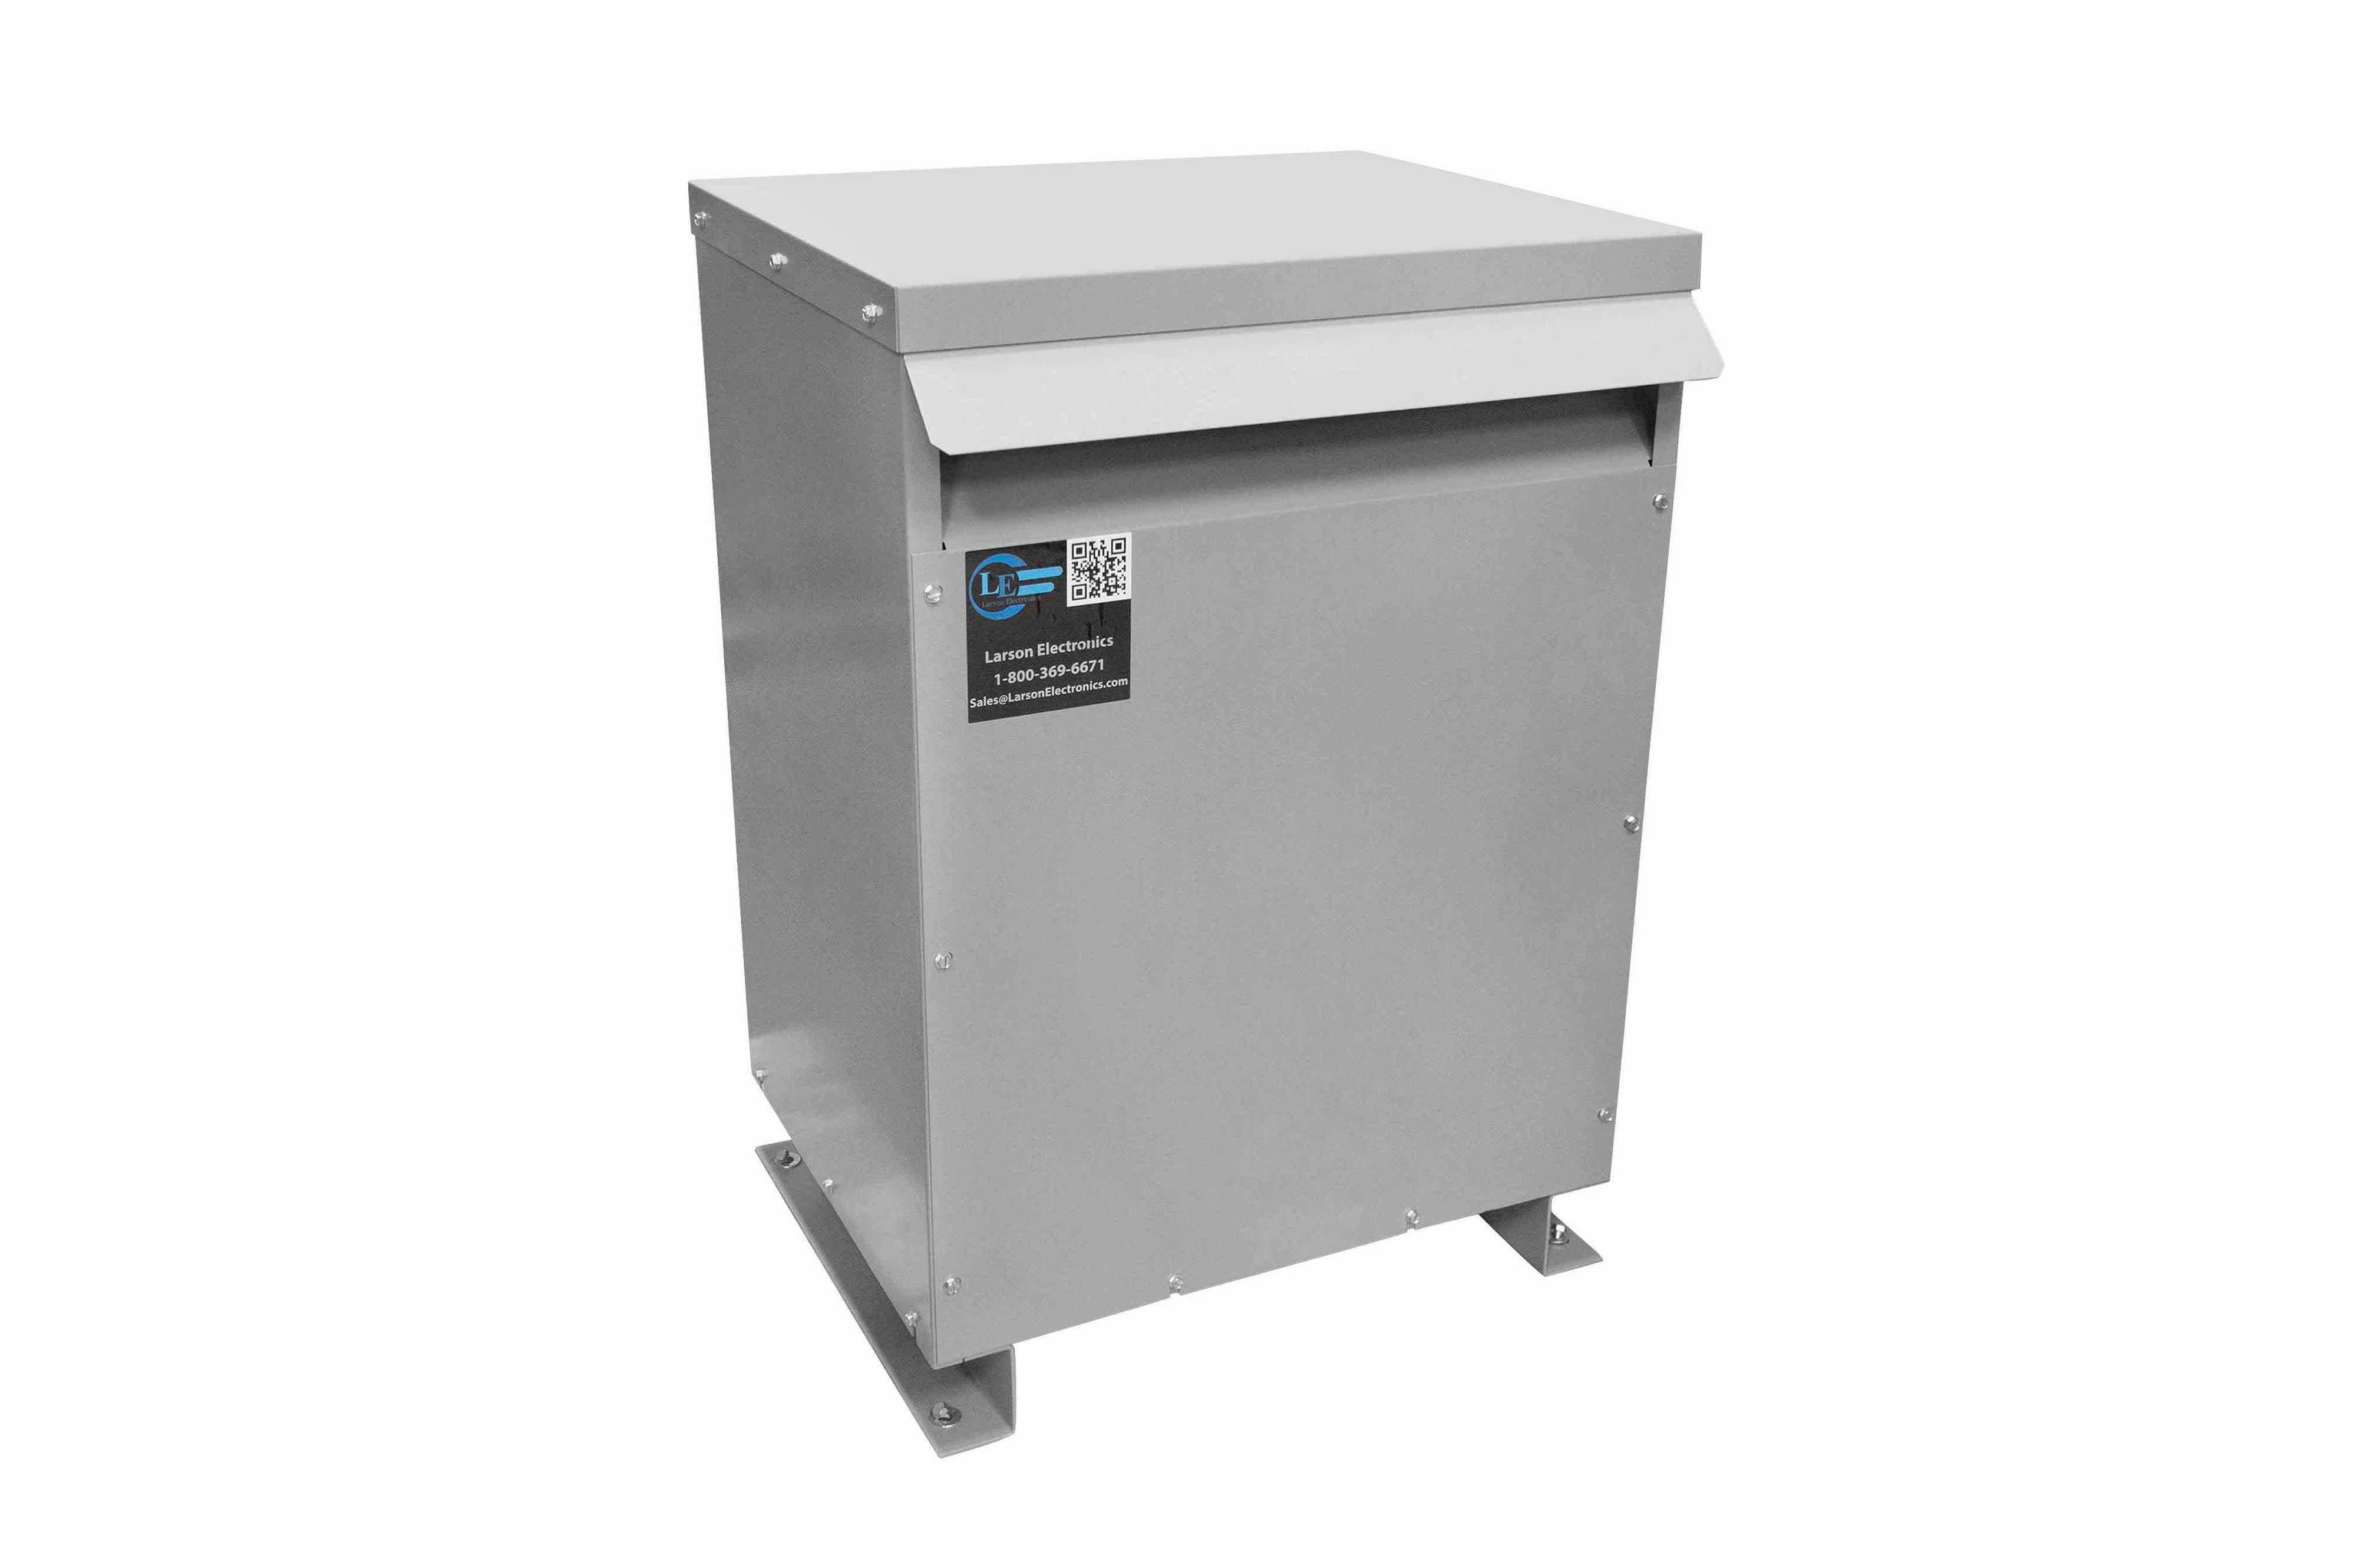 600 kVA 3PH Isolation Transformer, 208V Wye Primary, 400V Delta Secondary, N3R, Ventilated, 60 Hz